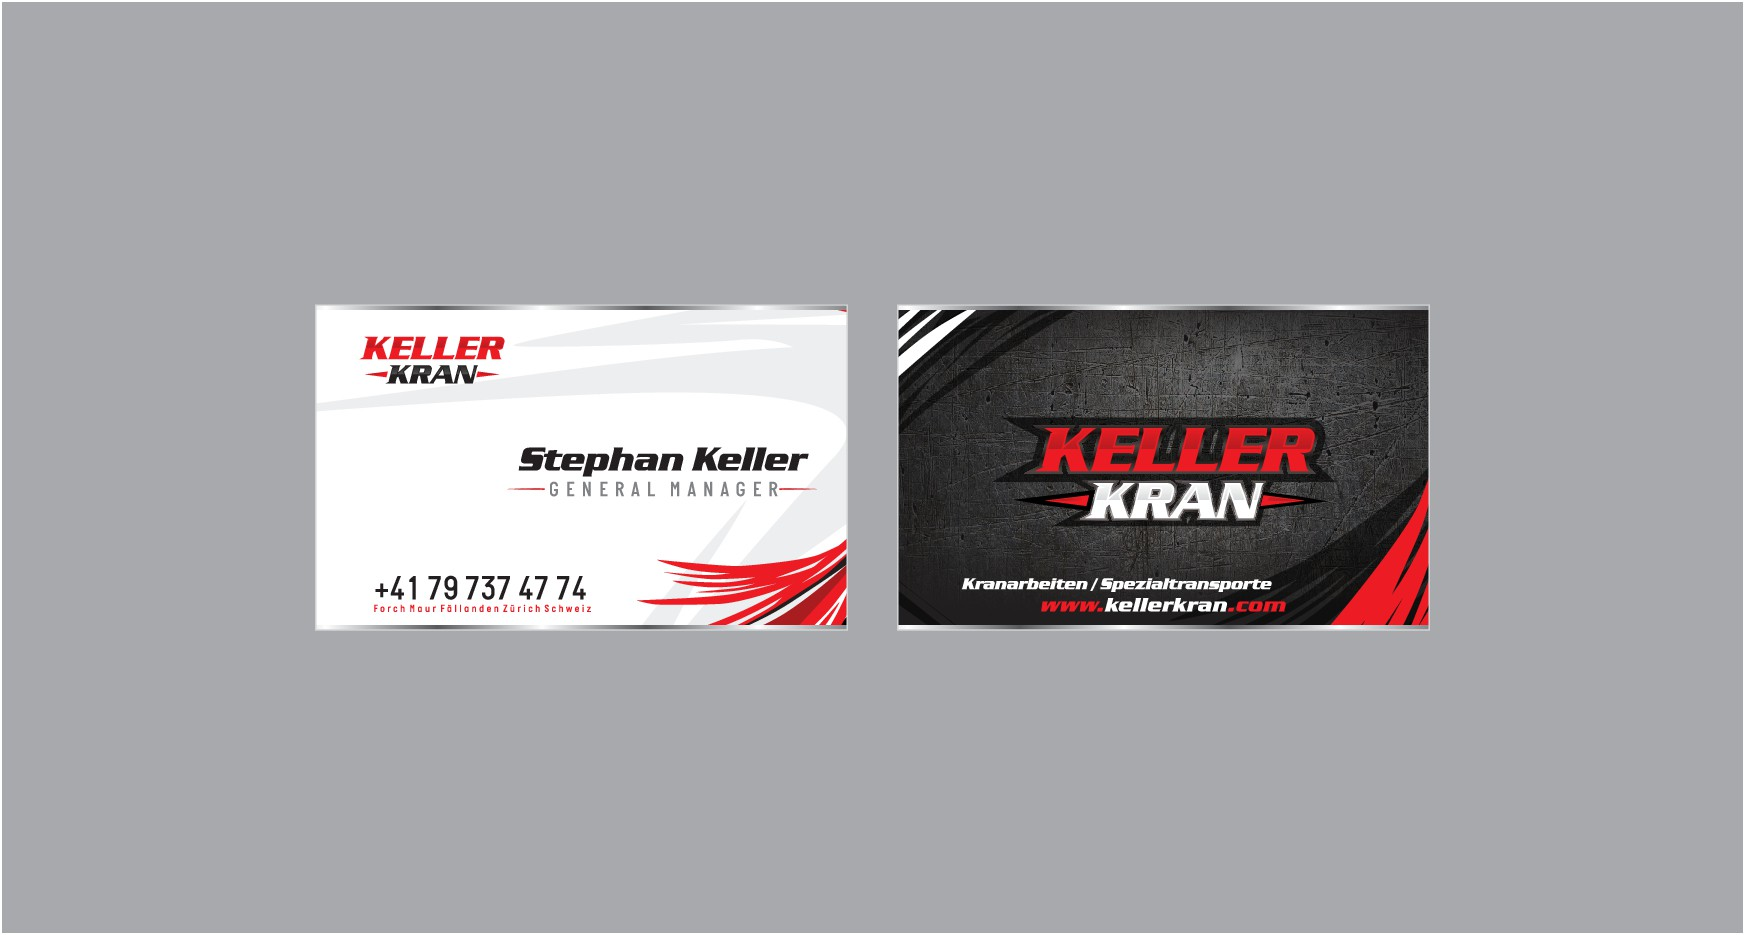 Keller Kran hebt ab